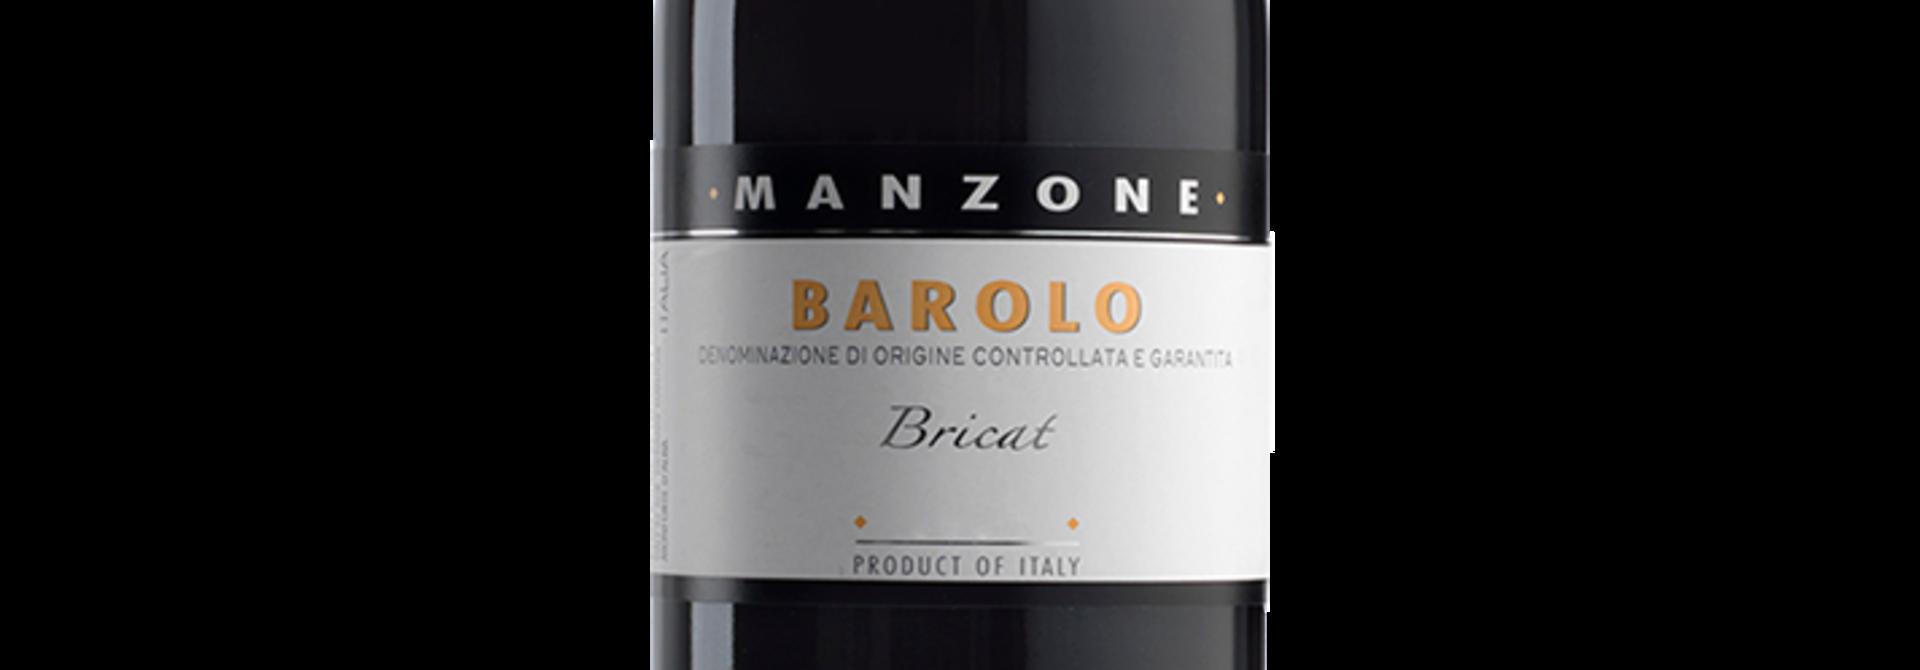 Manzone Barolo Bricat 2016